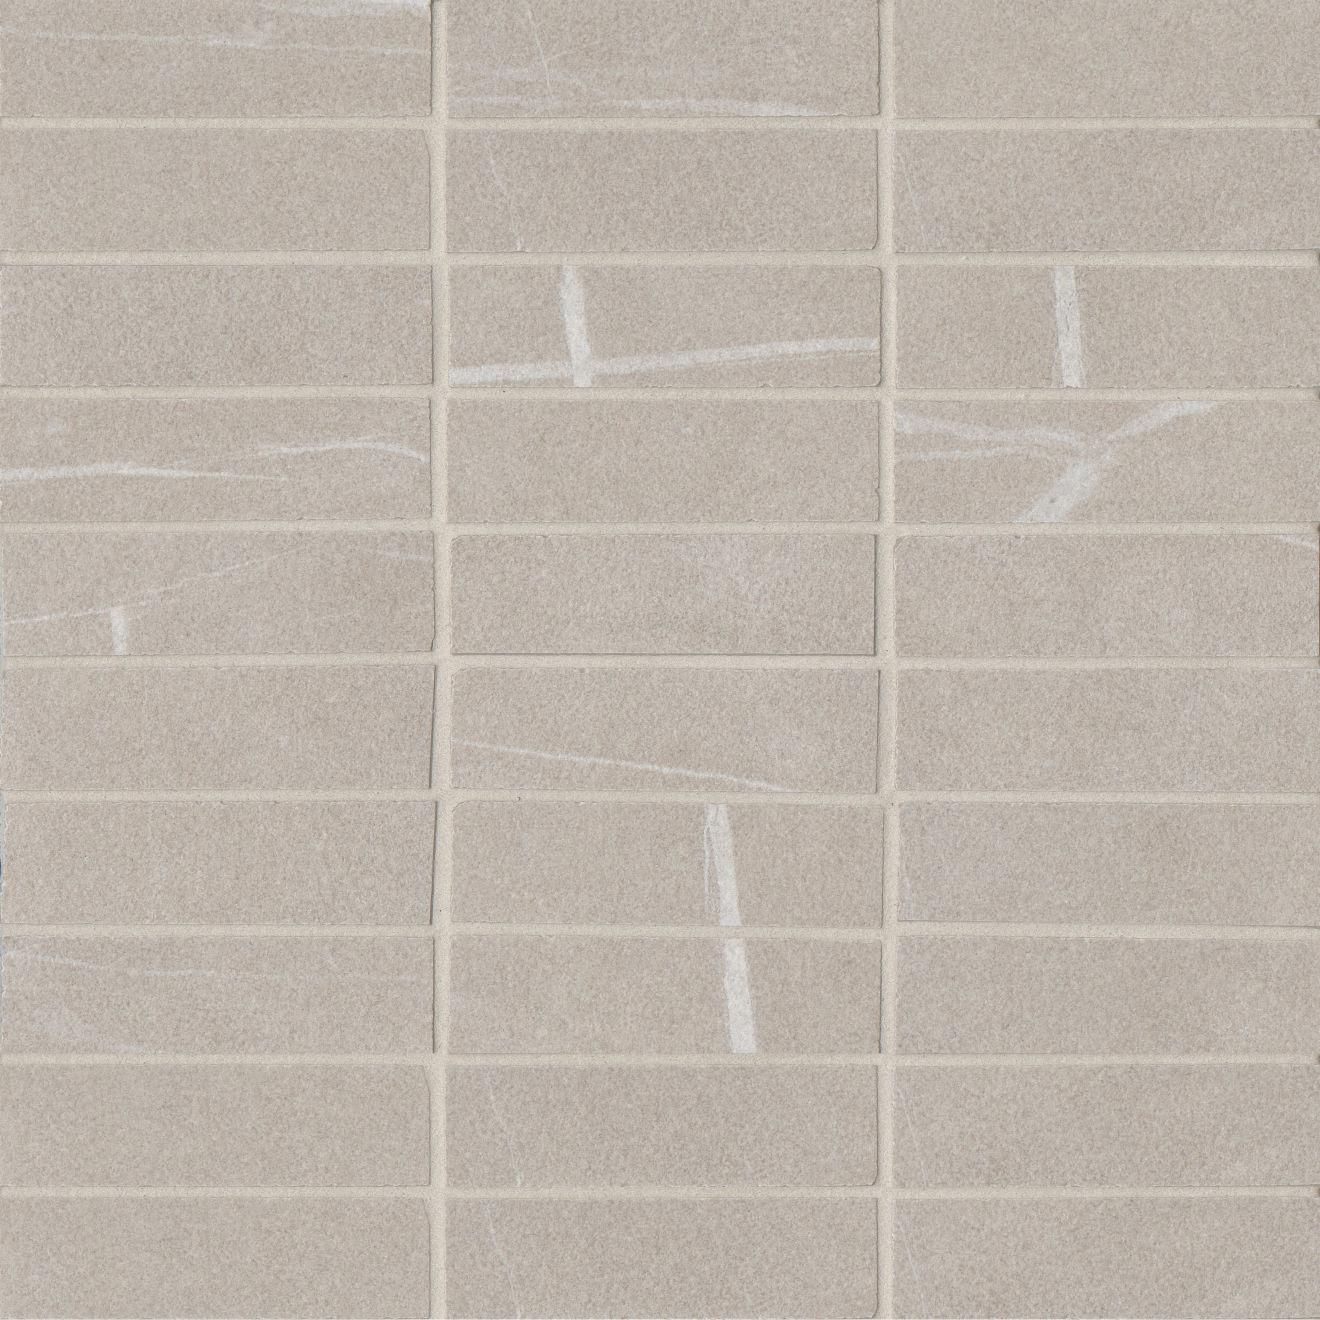 "Nomade 1""x4"" Matte Porcelain Mosaic Tile in Bone"